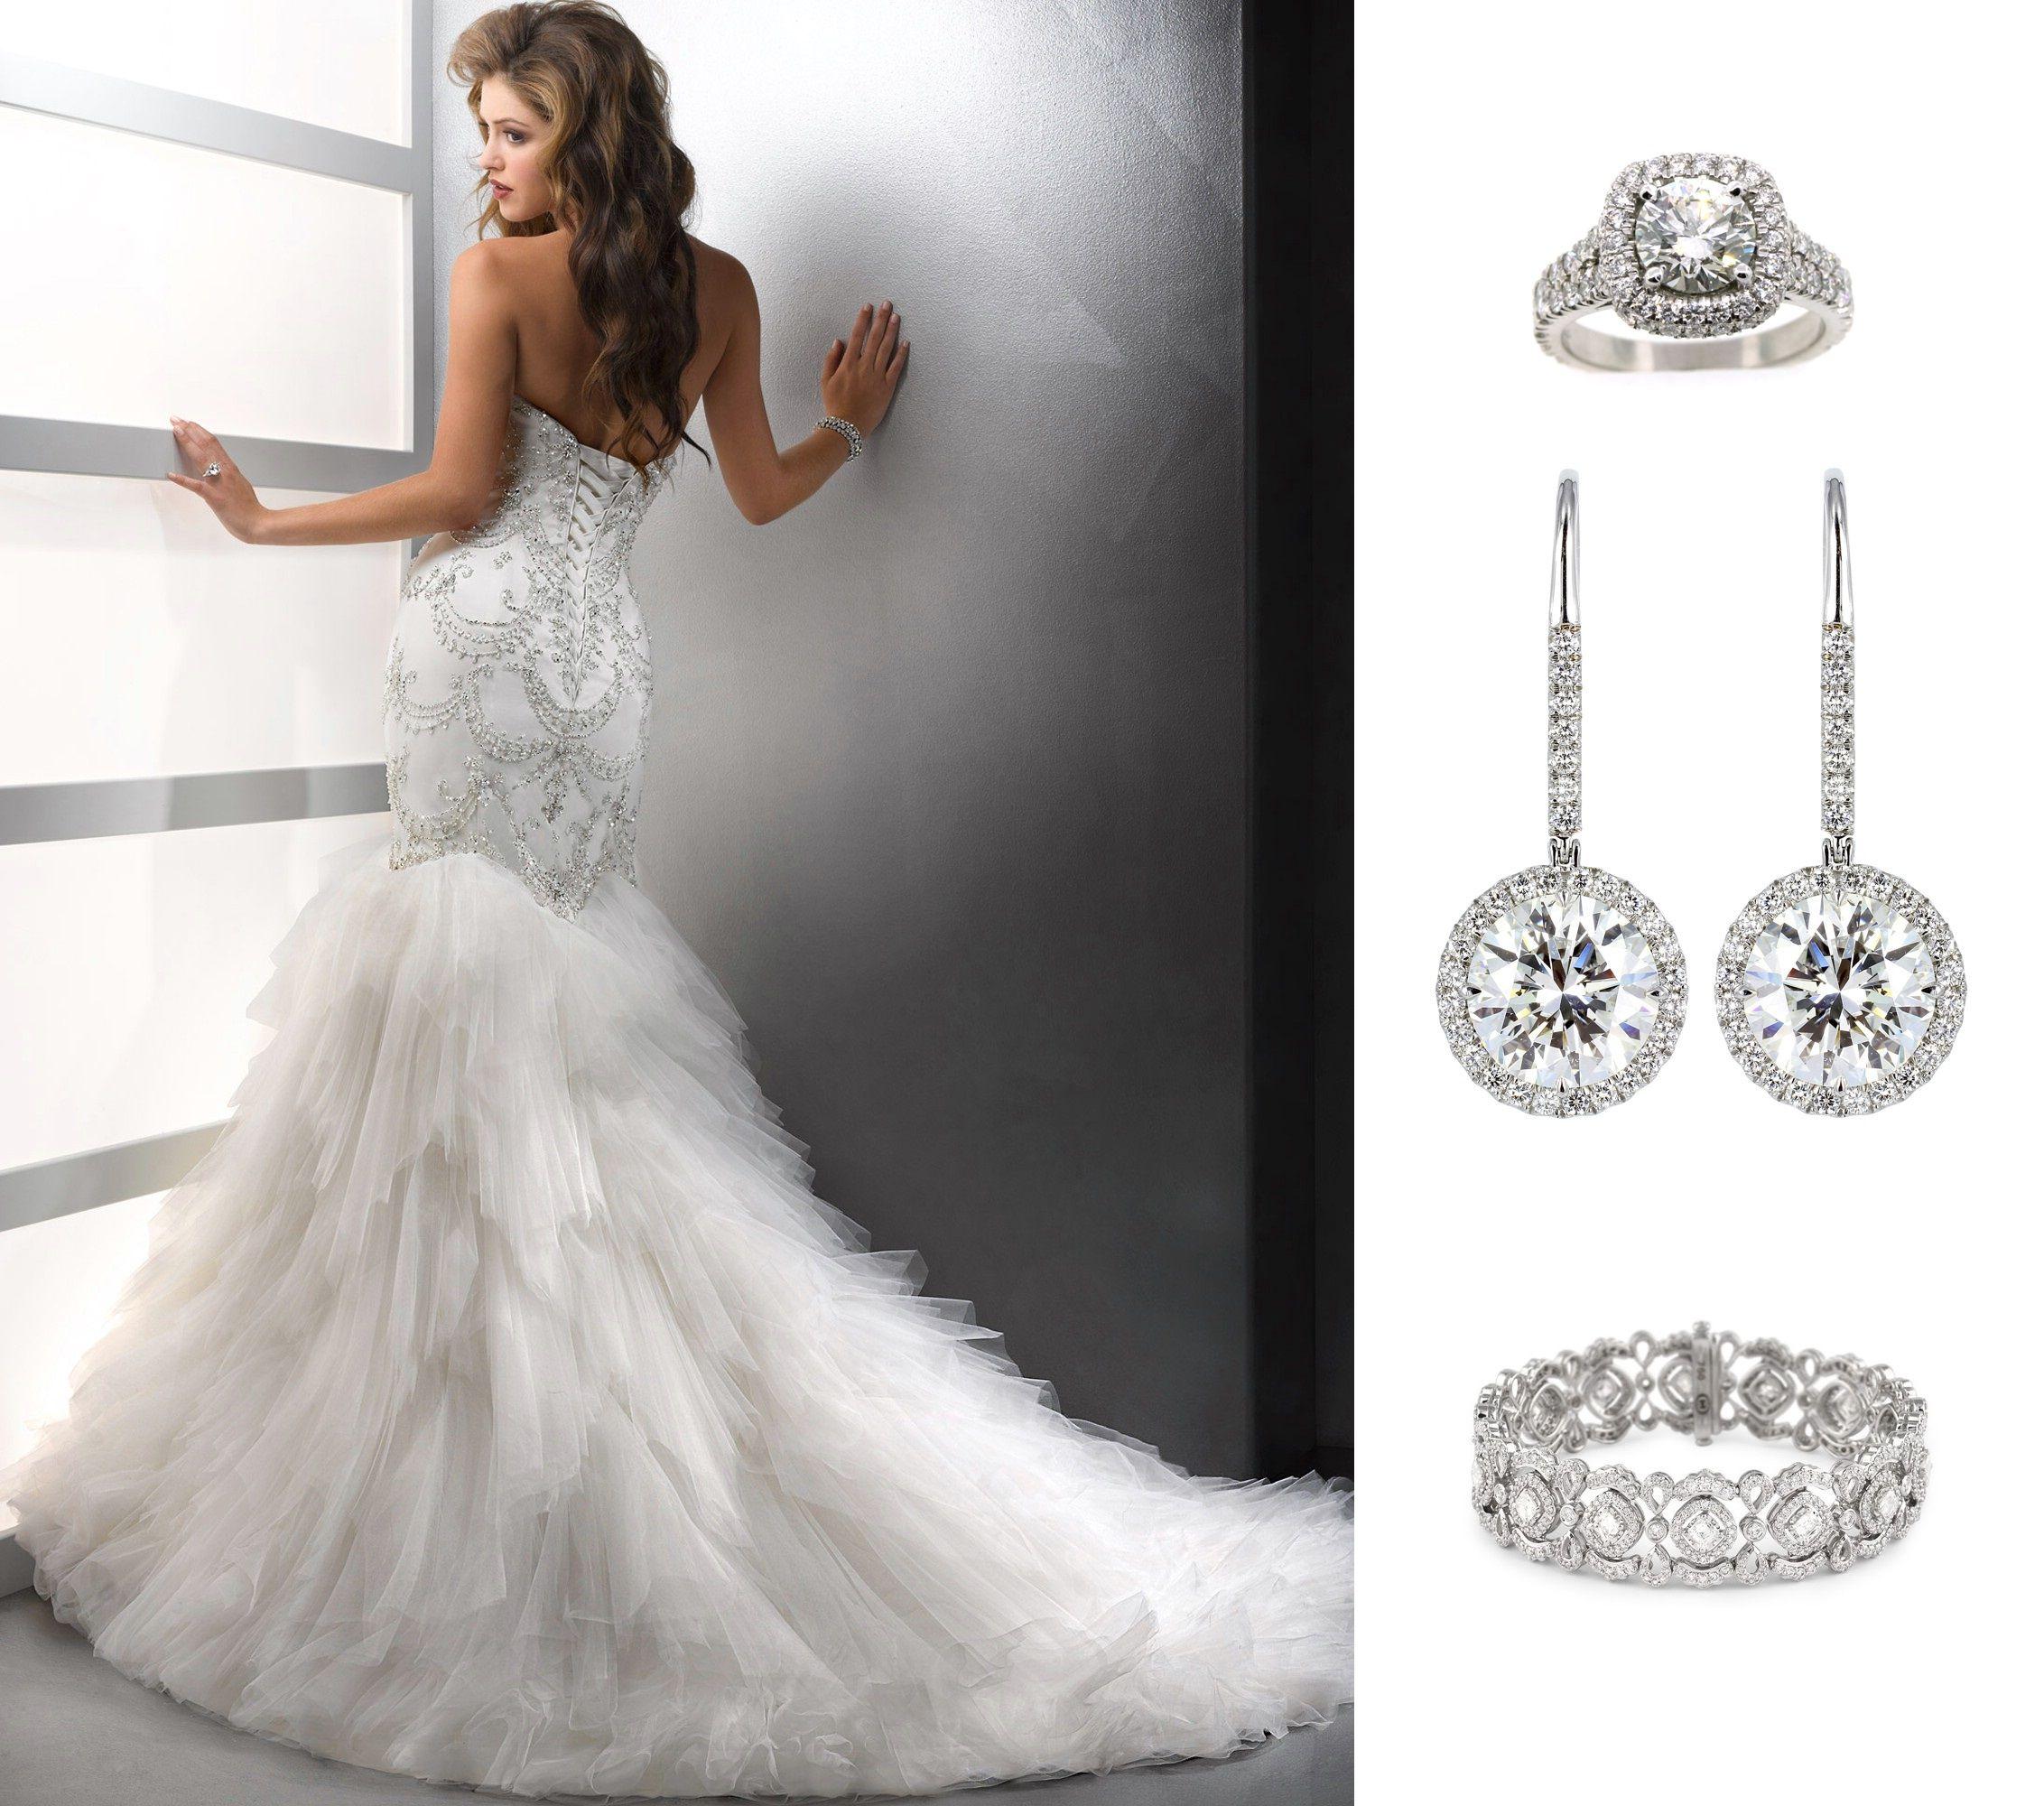 Shine brighter than a diamond! Mermaid wedding dress